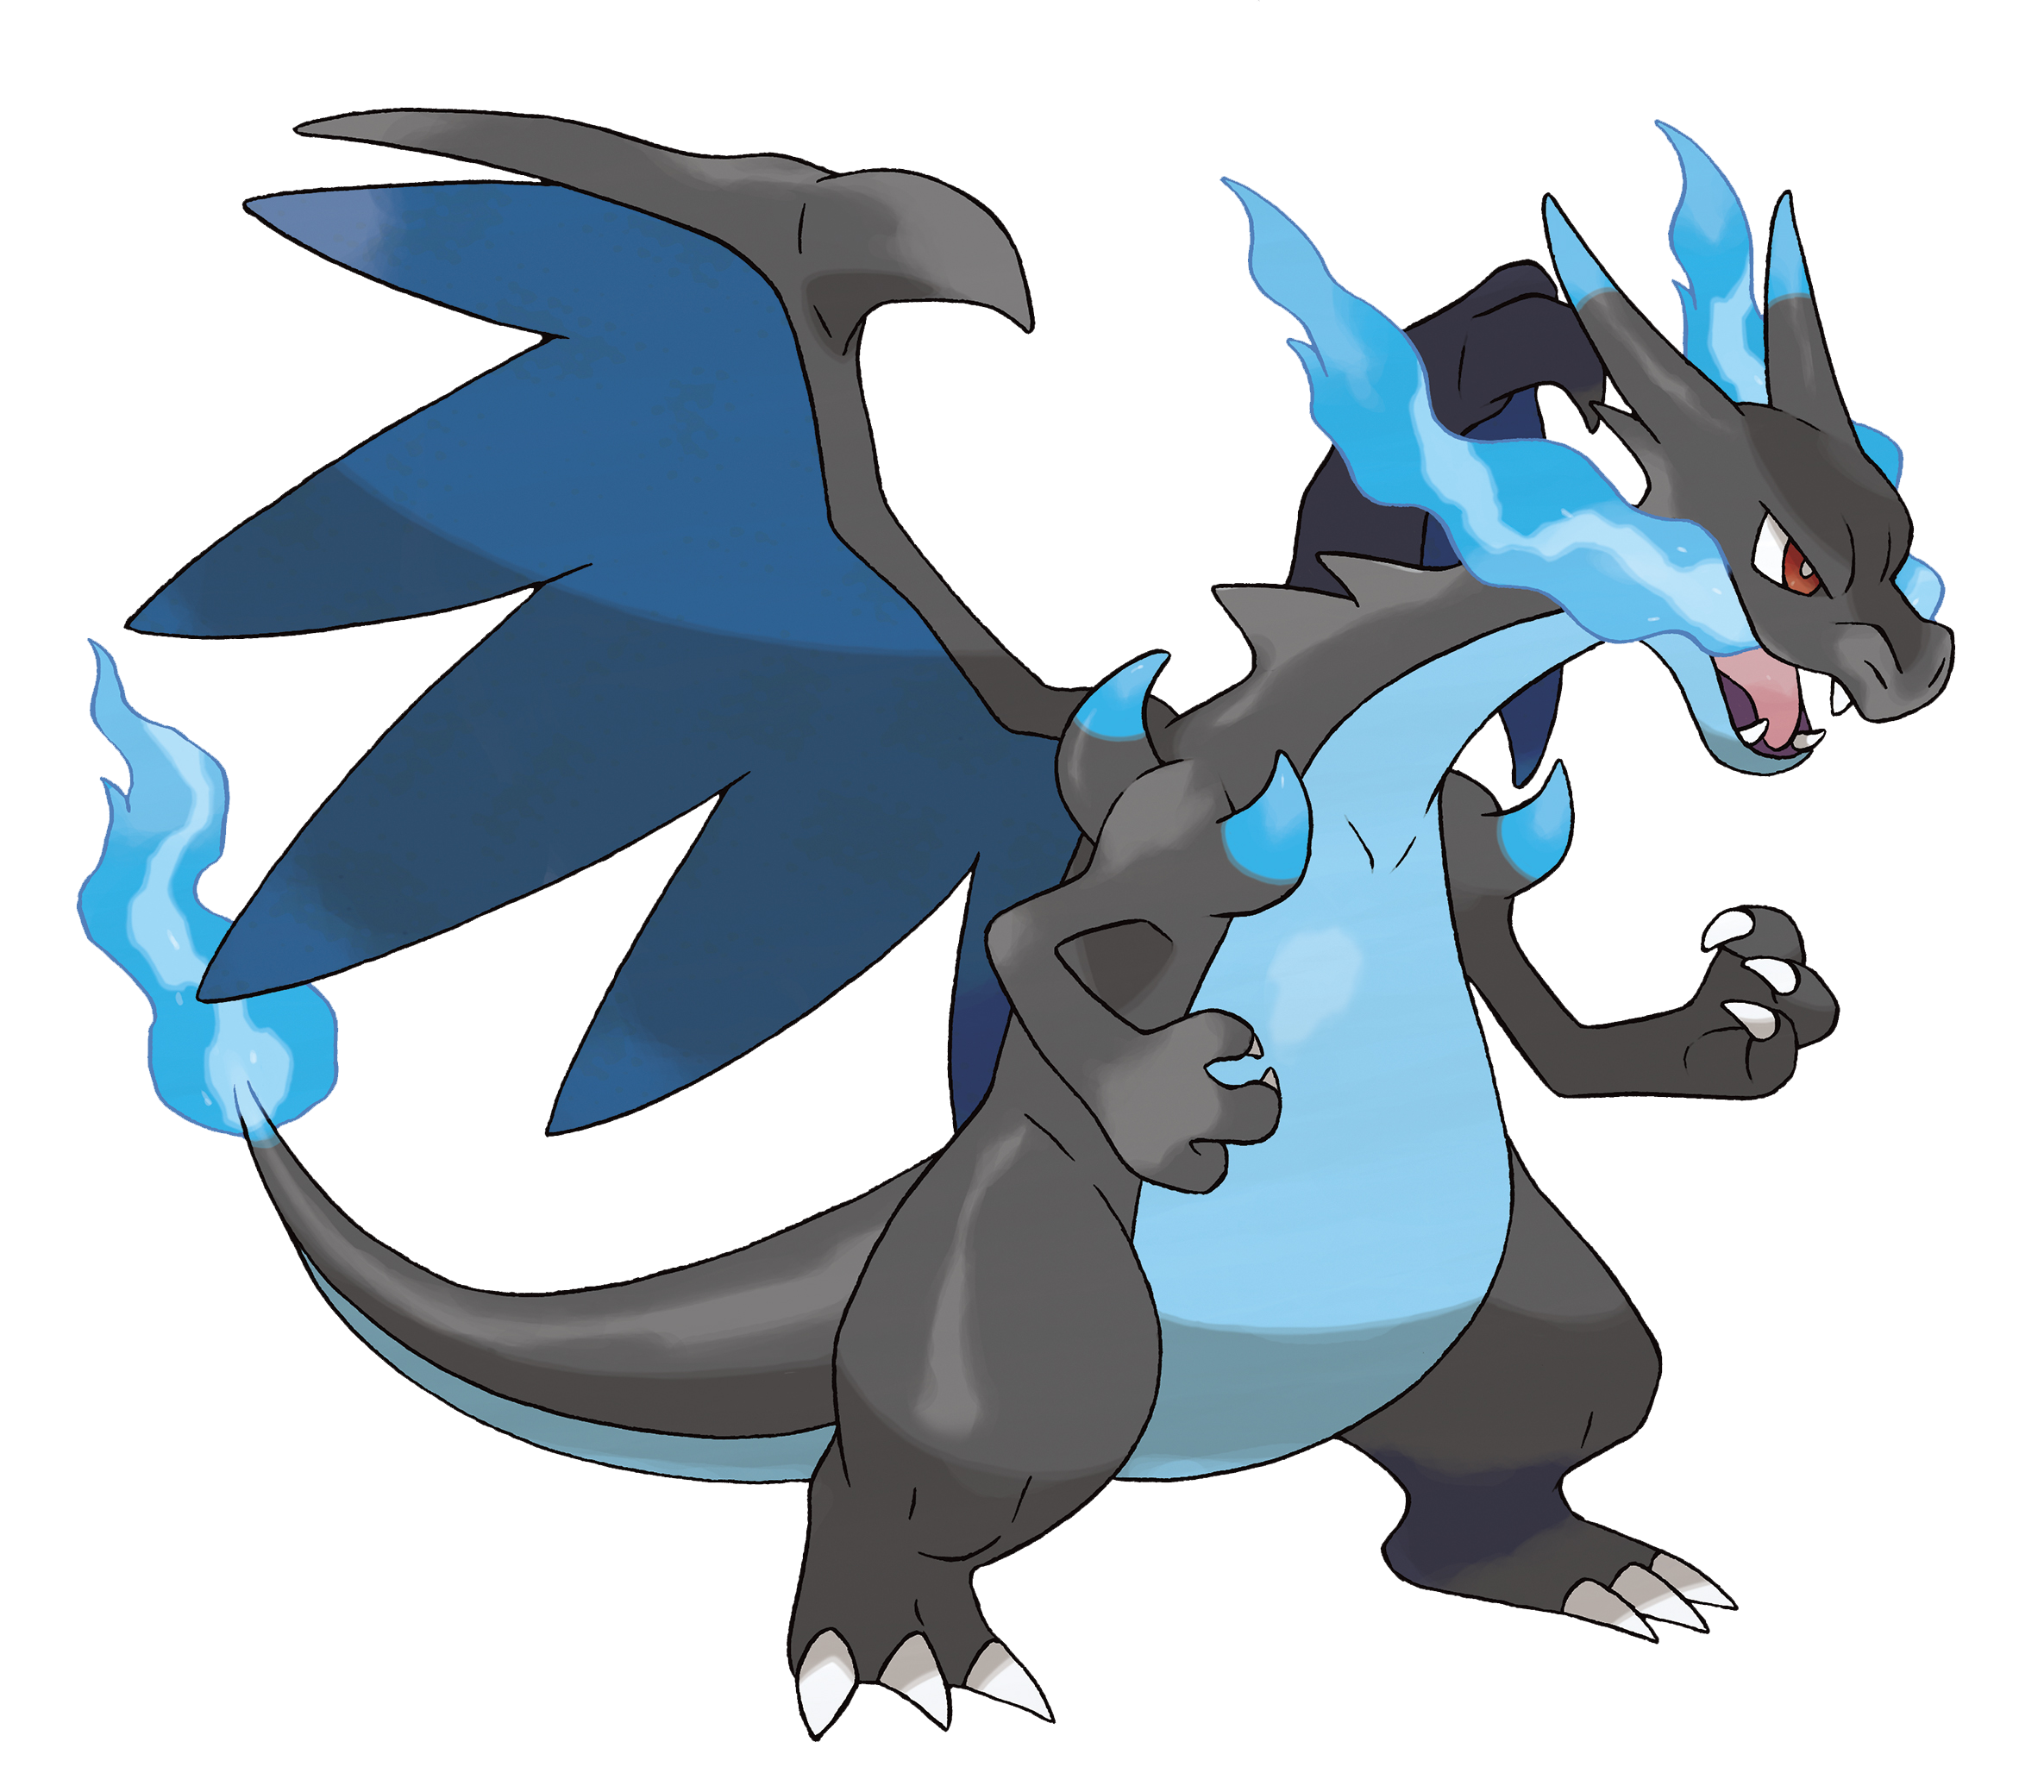 Mega Charizard X Y | Pokemon by moxie2D on DeviantArt |Pokemon X And Y Mega Evolutions Charizard